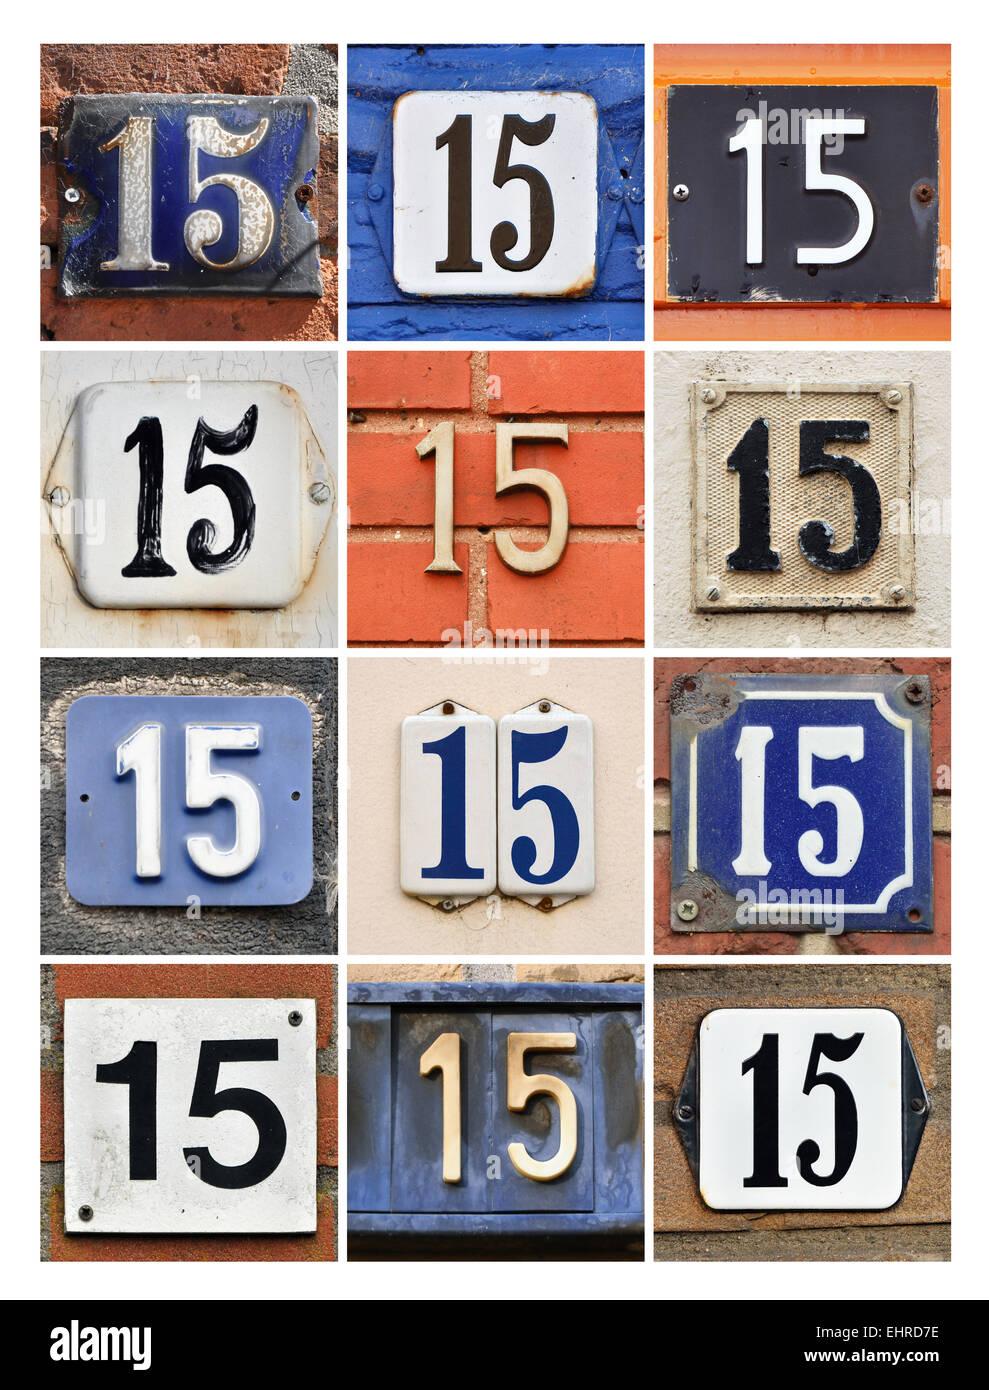 Número 15 - Collage de quince números de casa Imagen De Stock